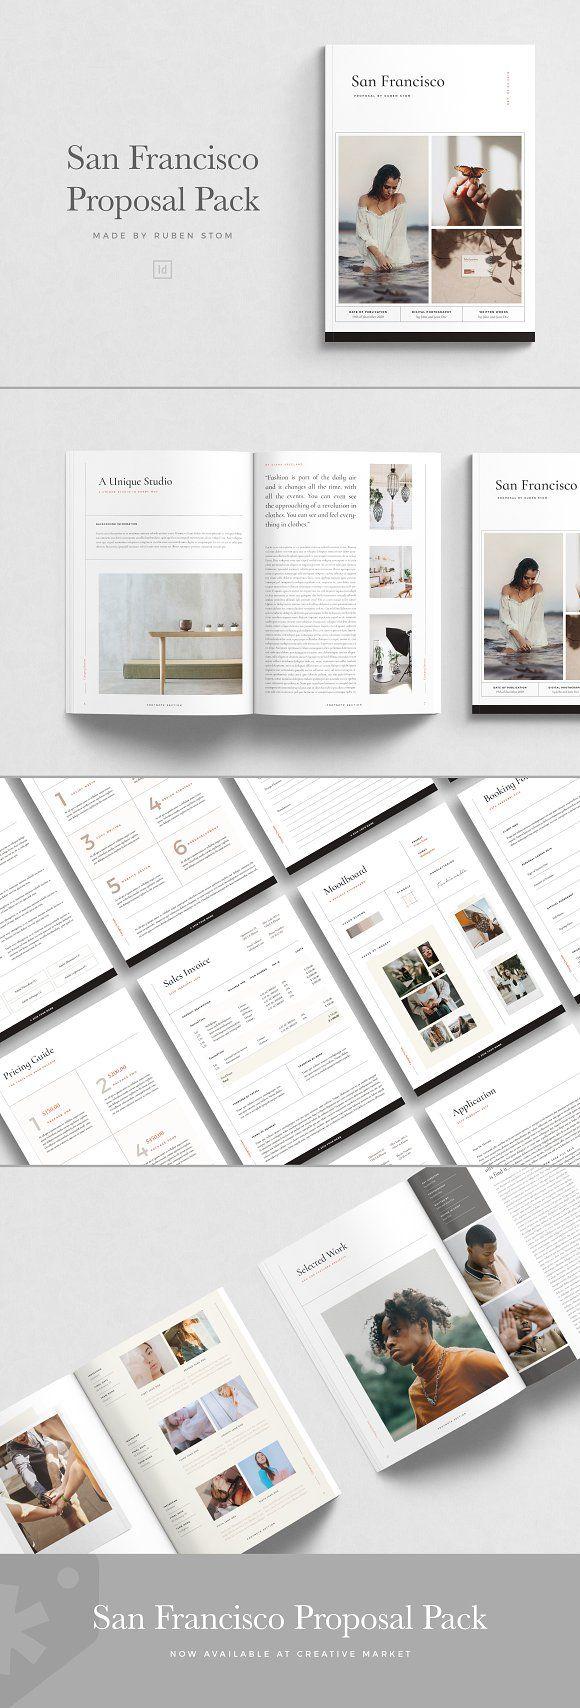 San Francisco Proposal Pack Indesign Templates Client Proposals Adobe Indesign Templates